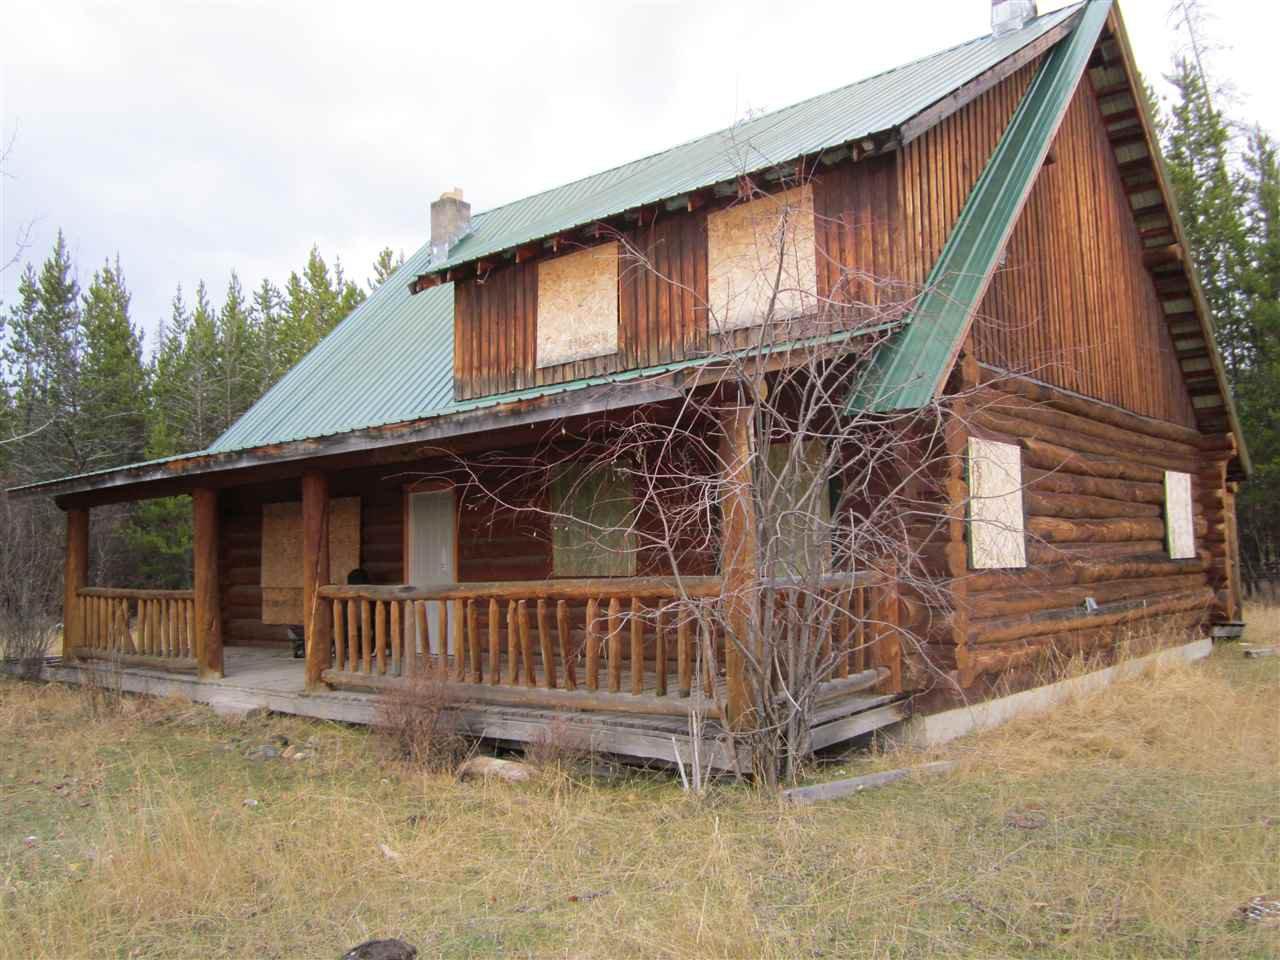 Main Photo: 651 JACKPINE Road: Horsefly House for sale (Williams Lake (Zone 27))  : MLS®# R2099546